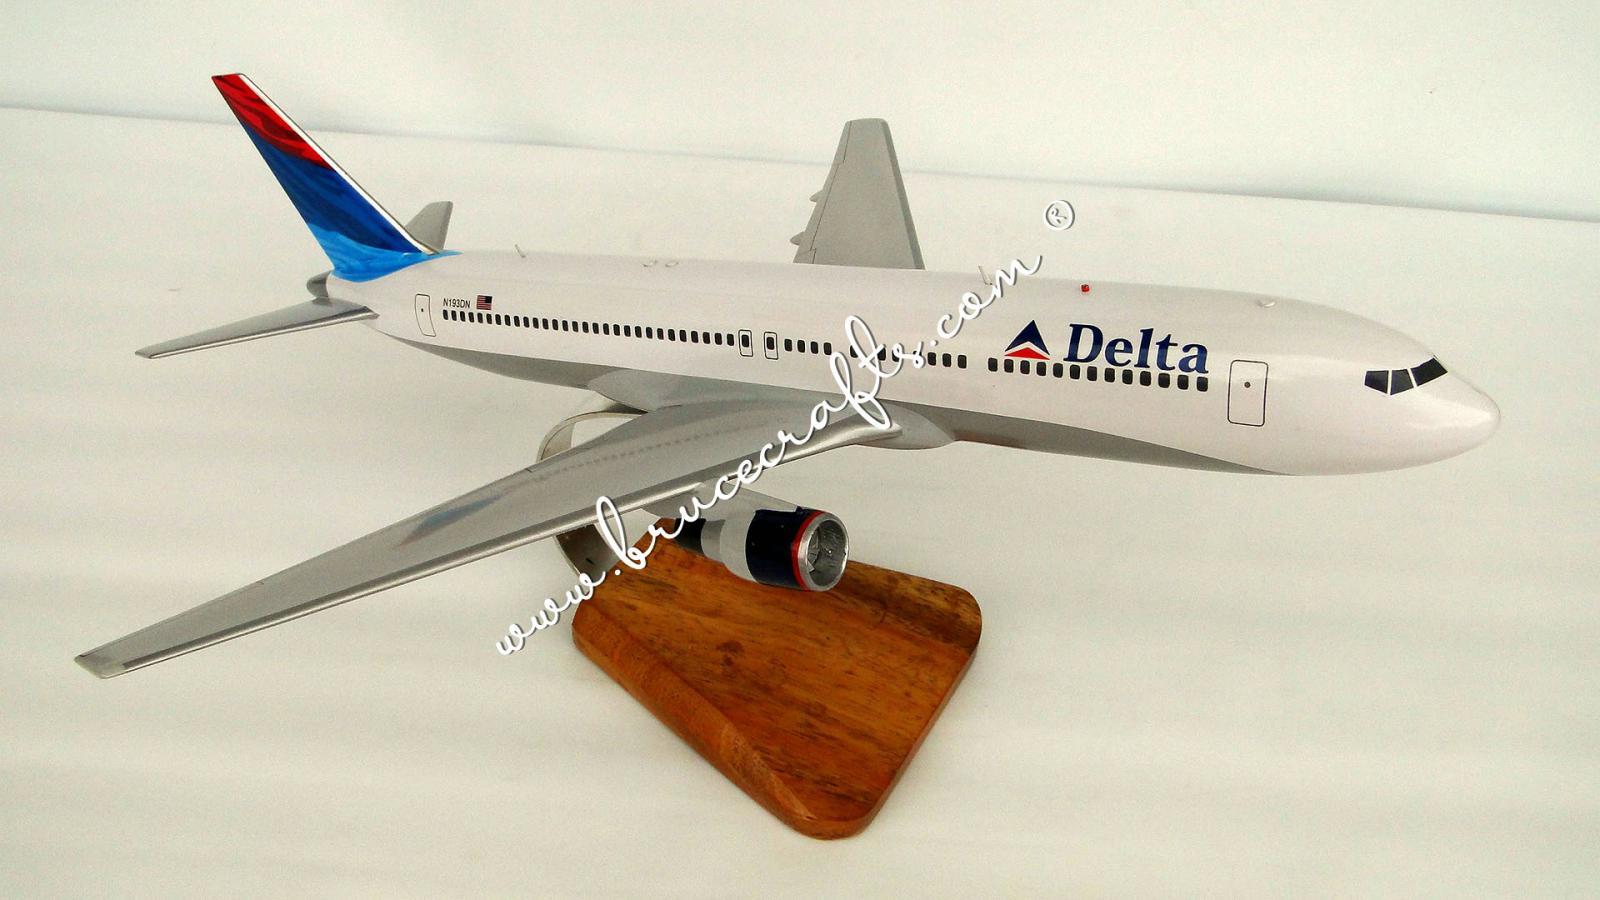 B767-300 Delta Air - Mahogany Wooden Aircraft Models – Boat & Ship Models Handmade Museum Quality